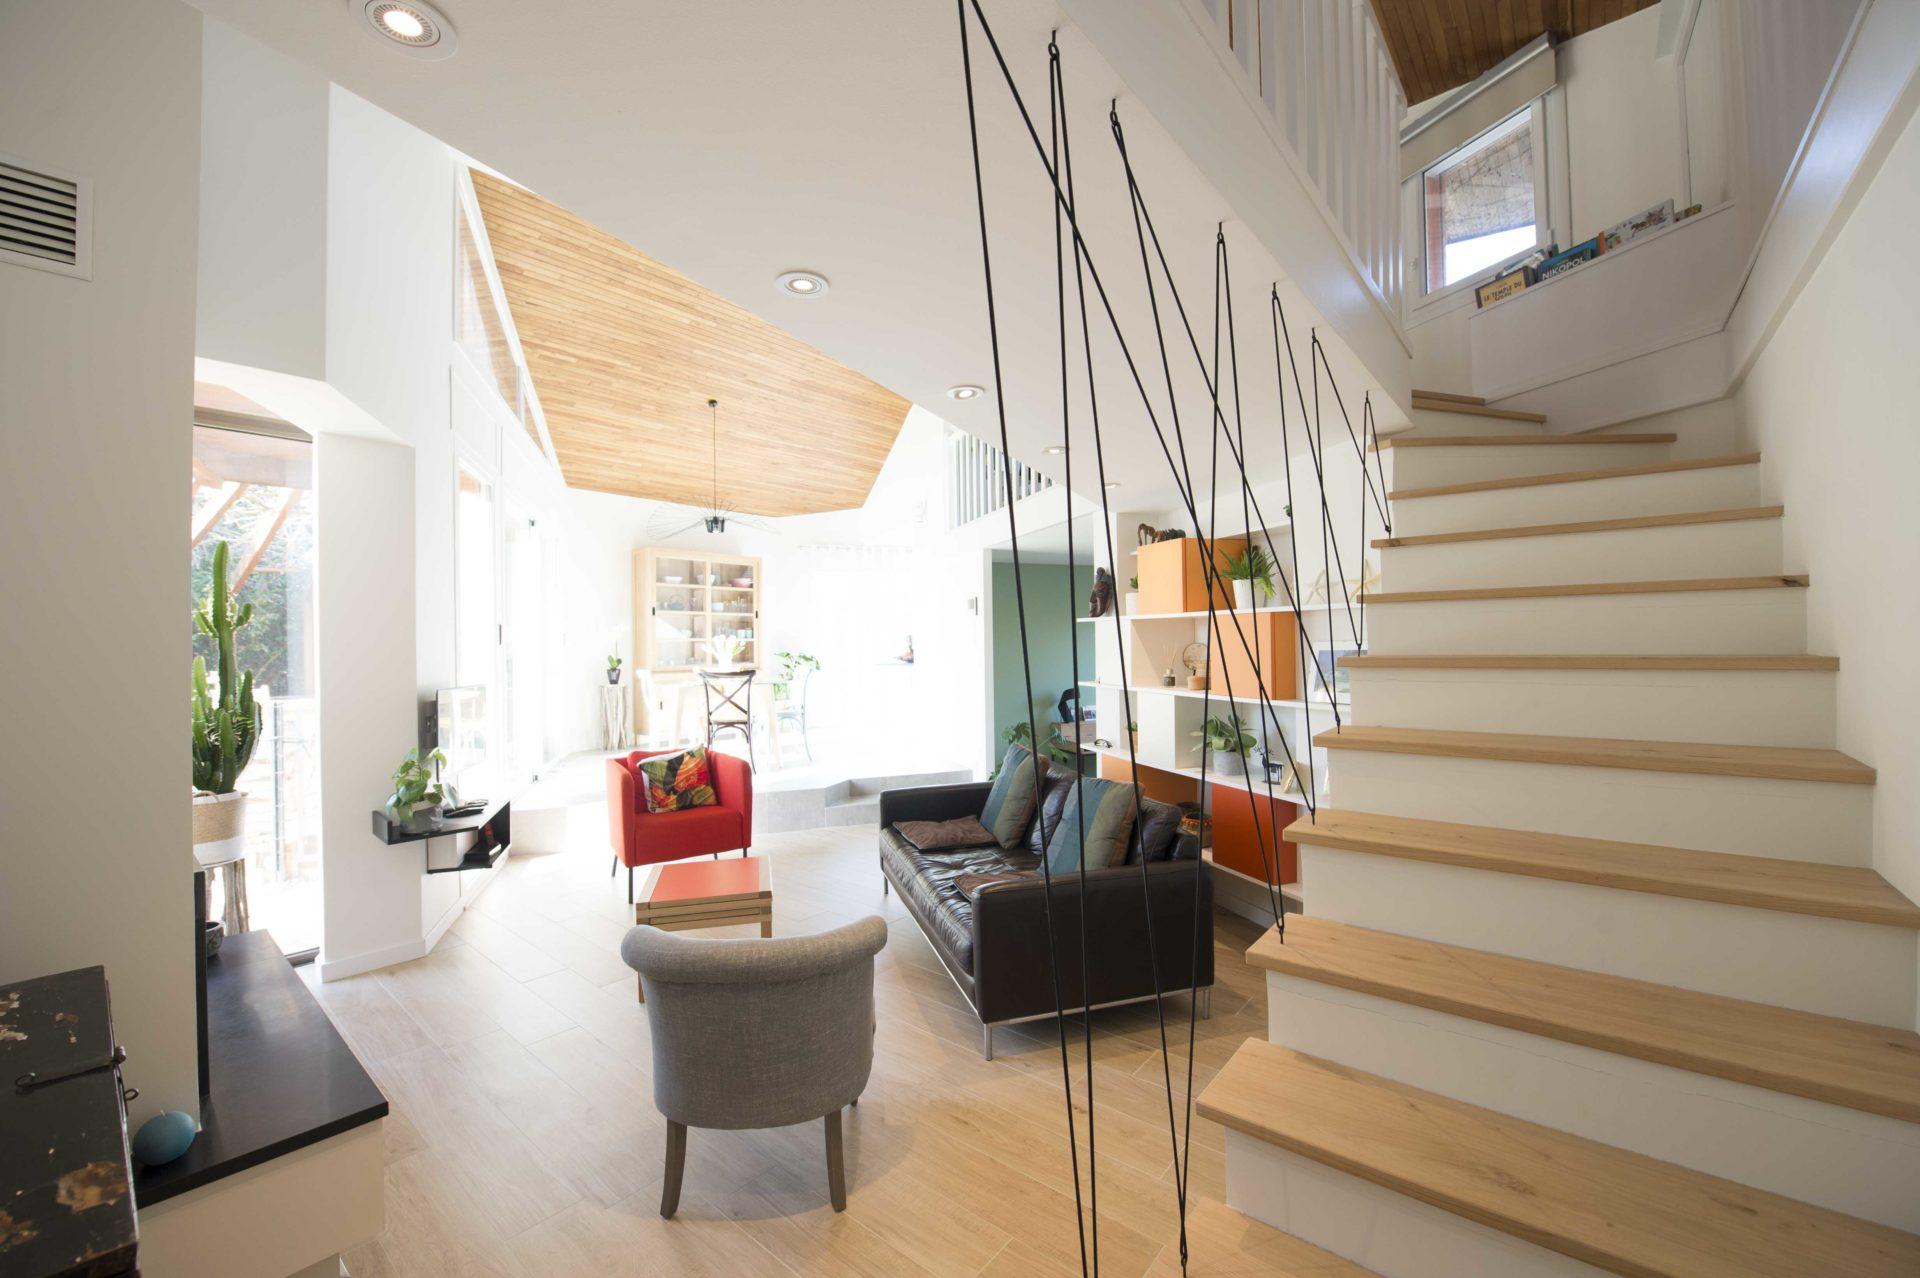 salon avec spot au plafond